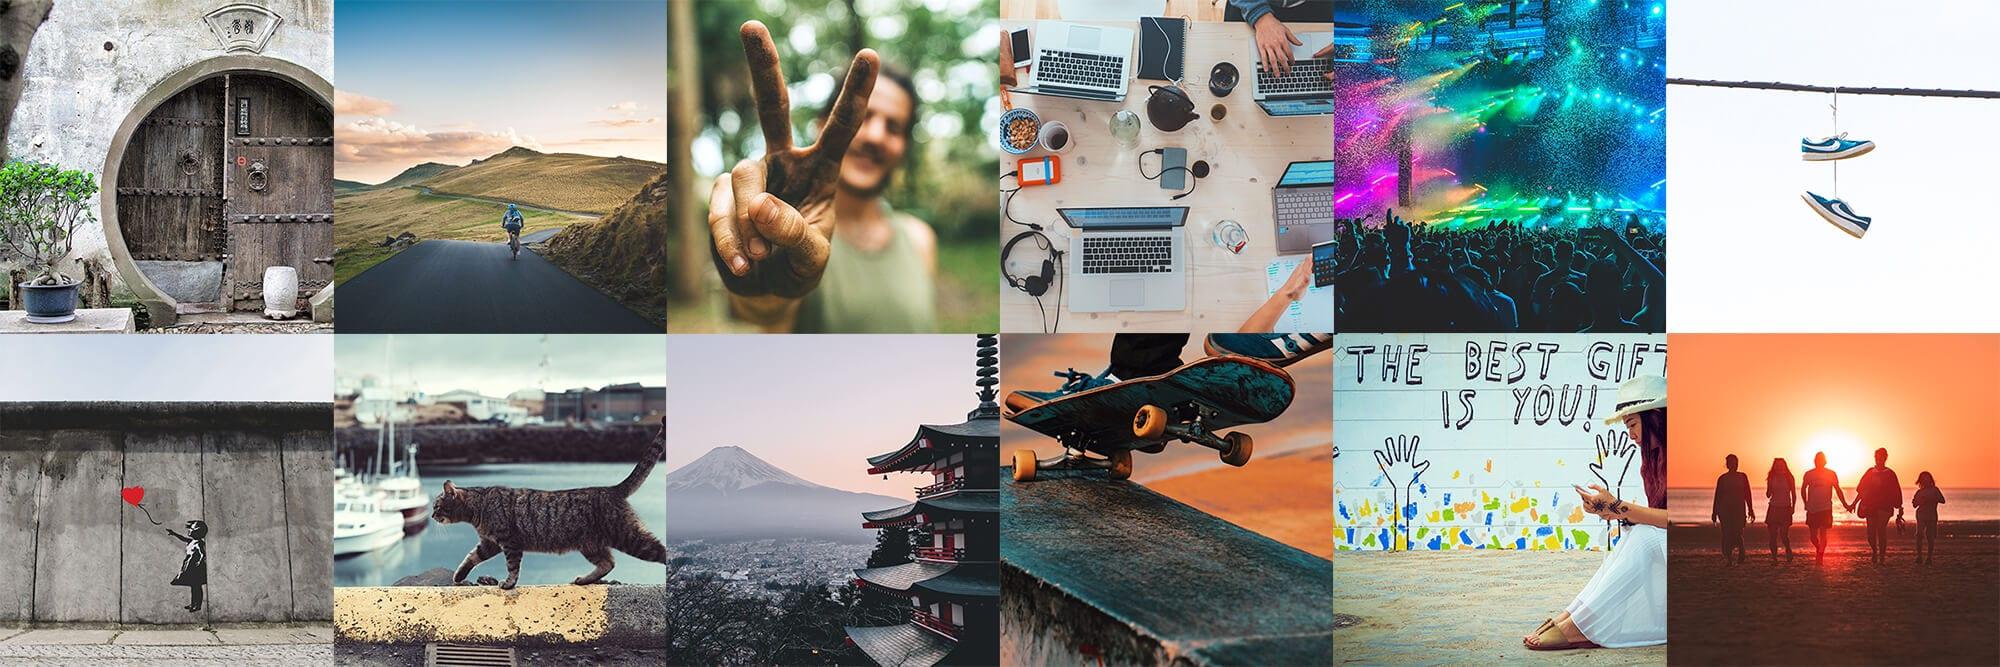 Silva Web Designs - Journey - What we love - WordPress